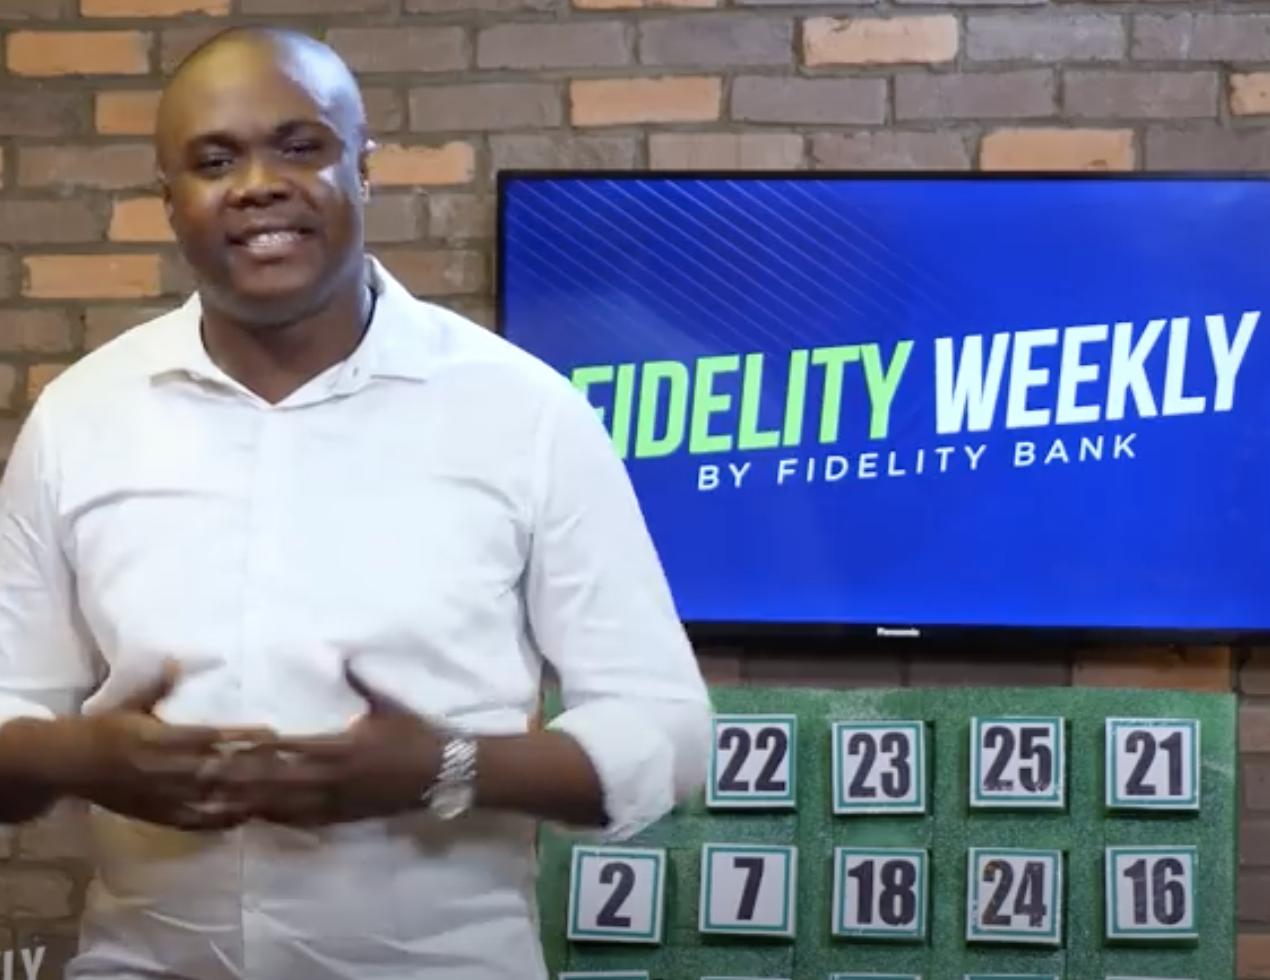 Fidelity Weekly Episode 4-Gender Games